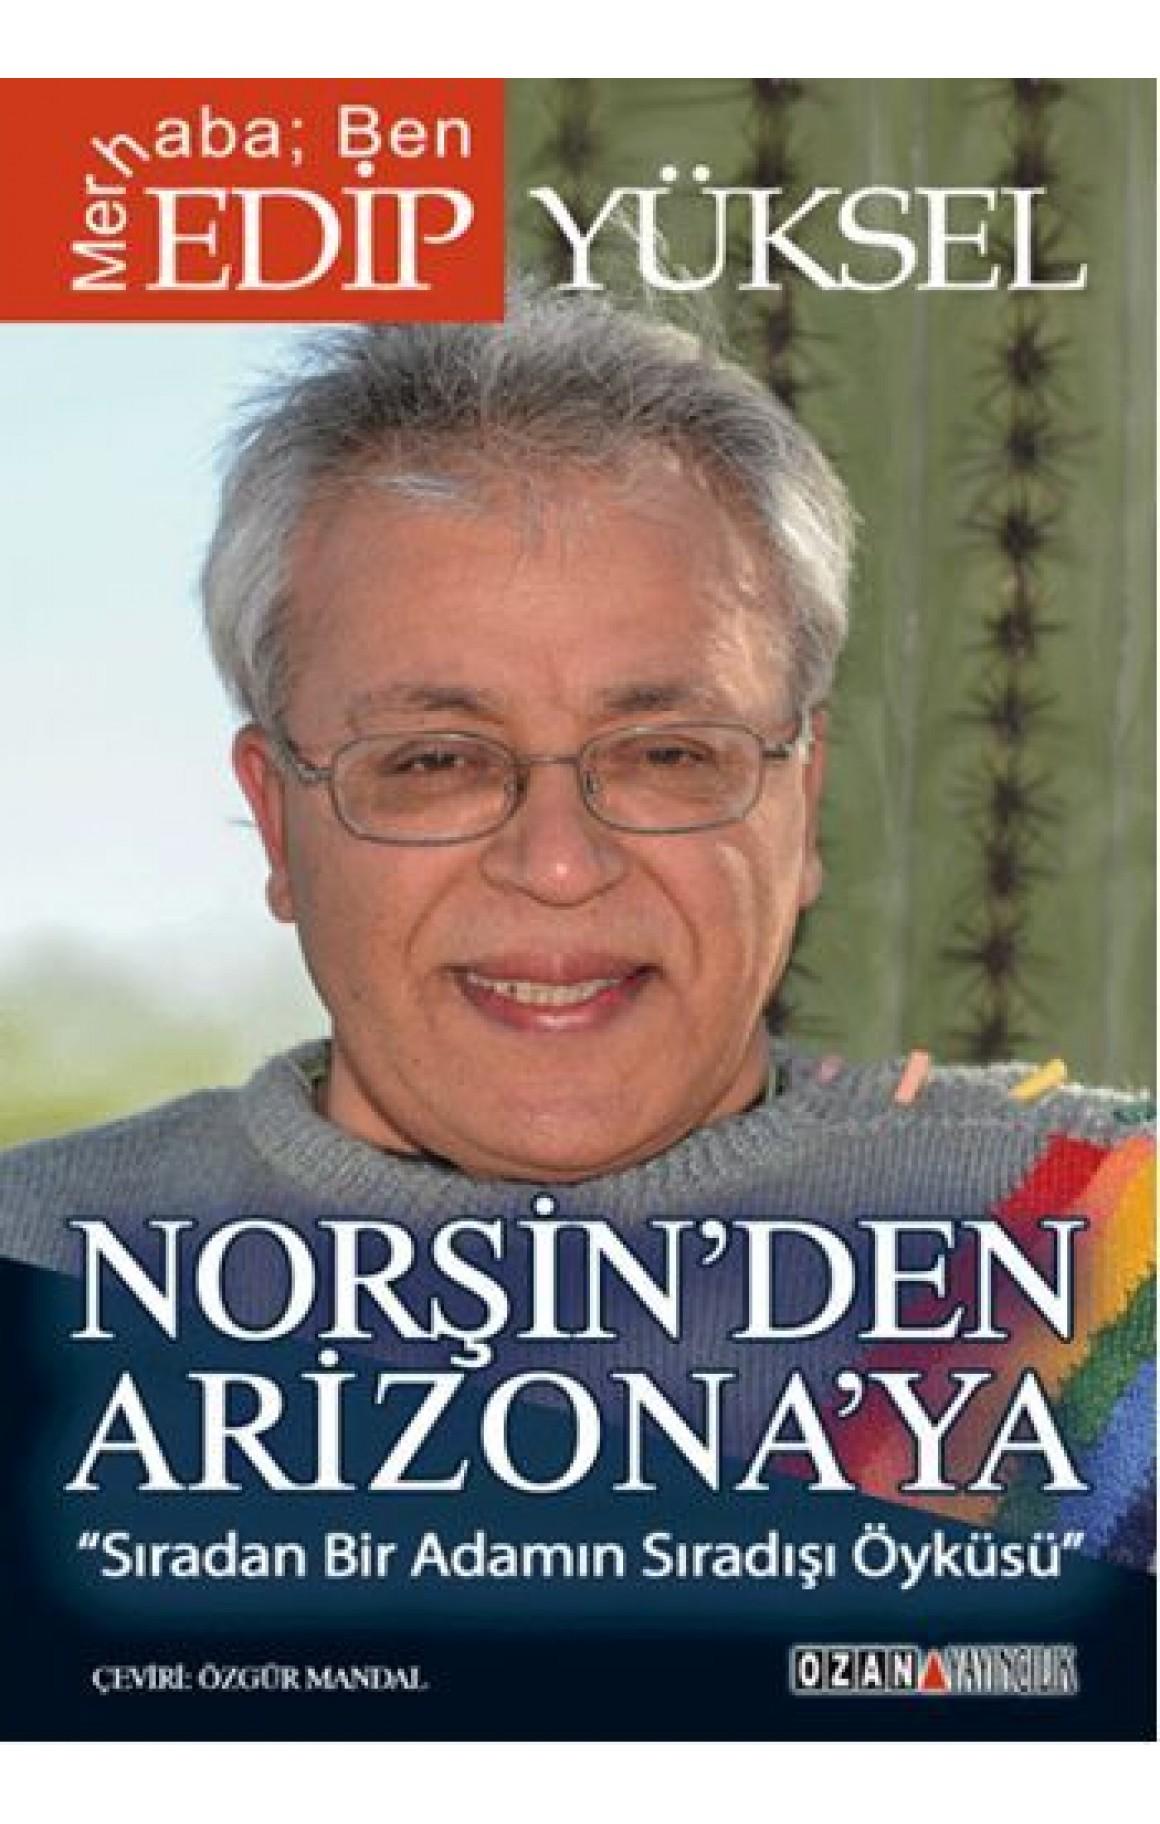 Norşin'den Arizona'ya Edip Yüksel